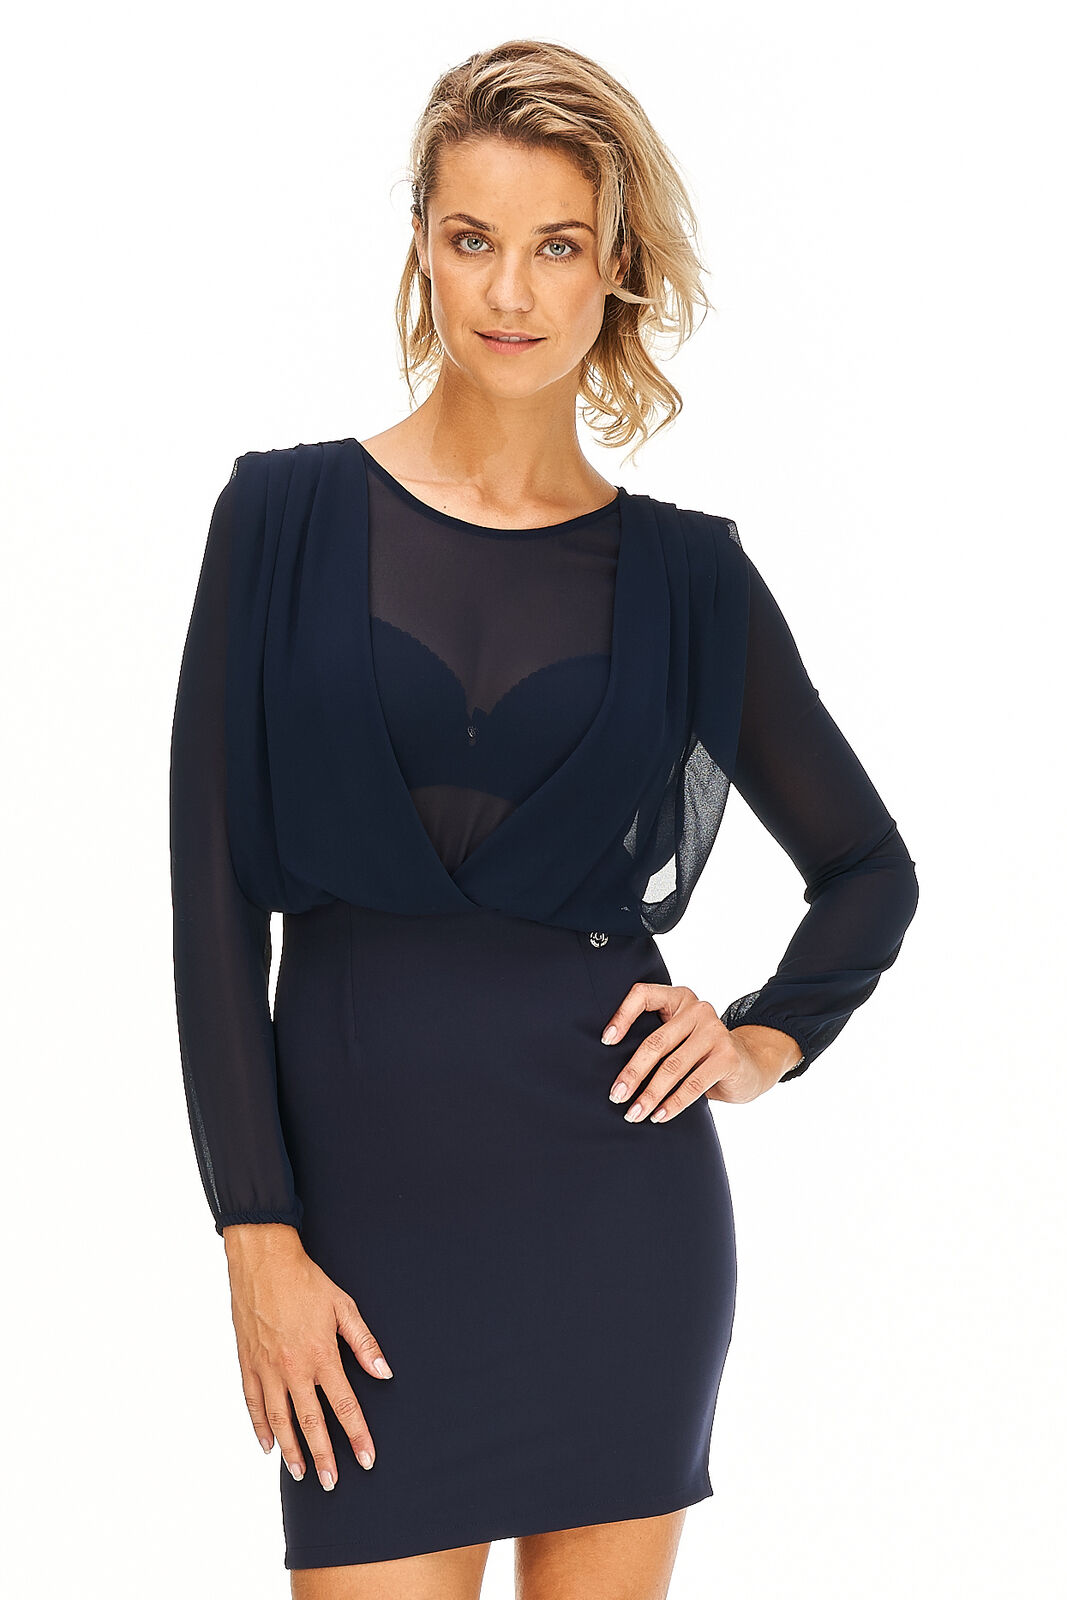 Gaudi - Kleid Damen blau Blause Oberteil elegant Premium Neu